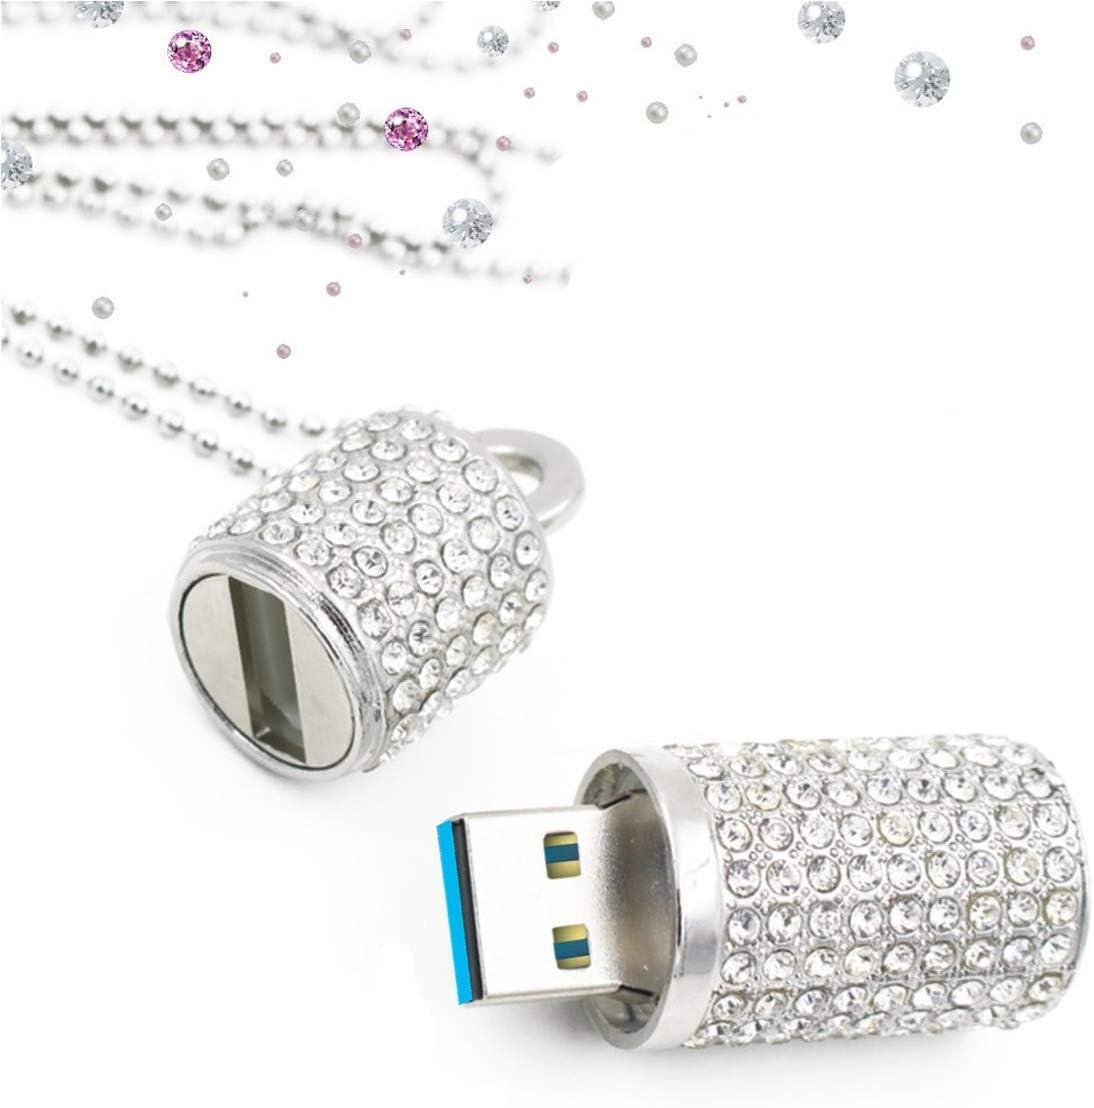 EcooDisk 128GB Chicago Mall USB 3.0 Flash Drive Shape Dr Lipstick store Diamond Zip